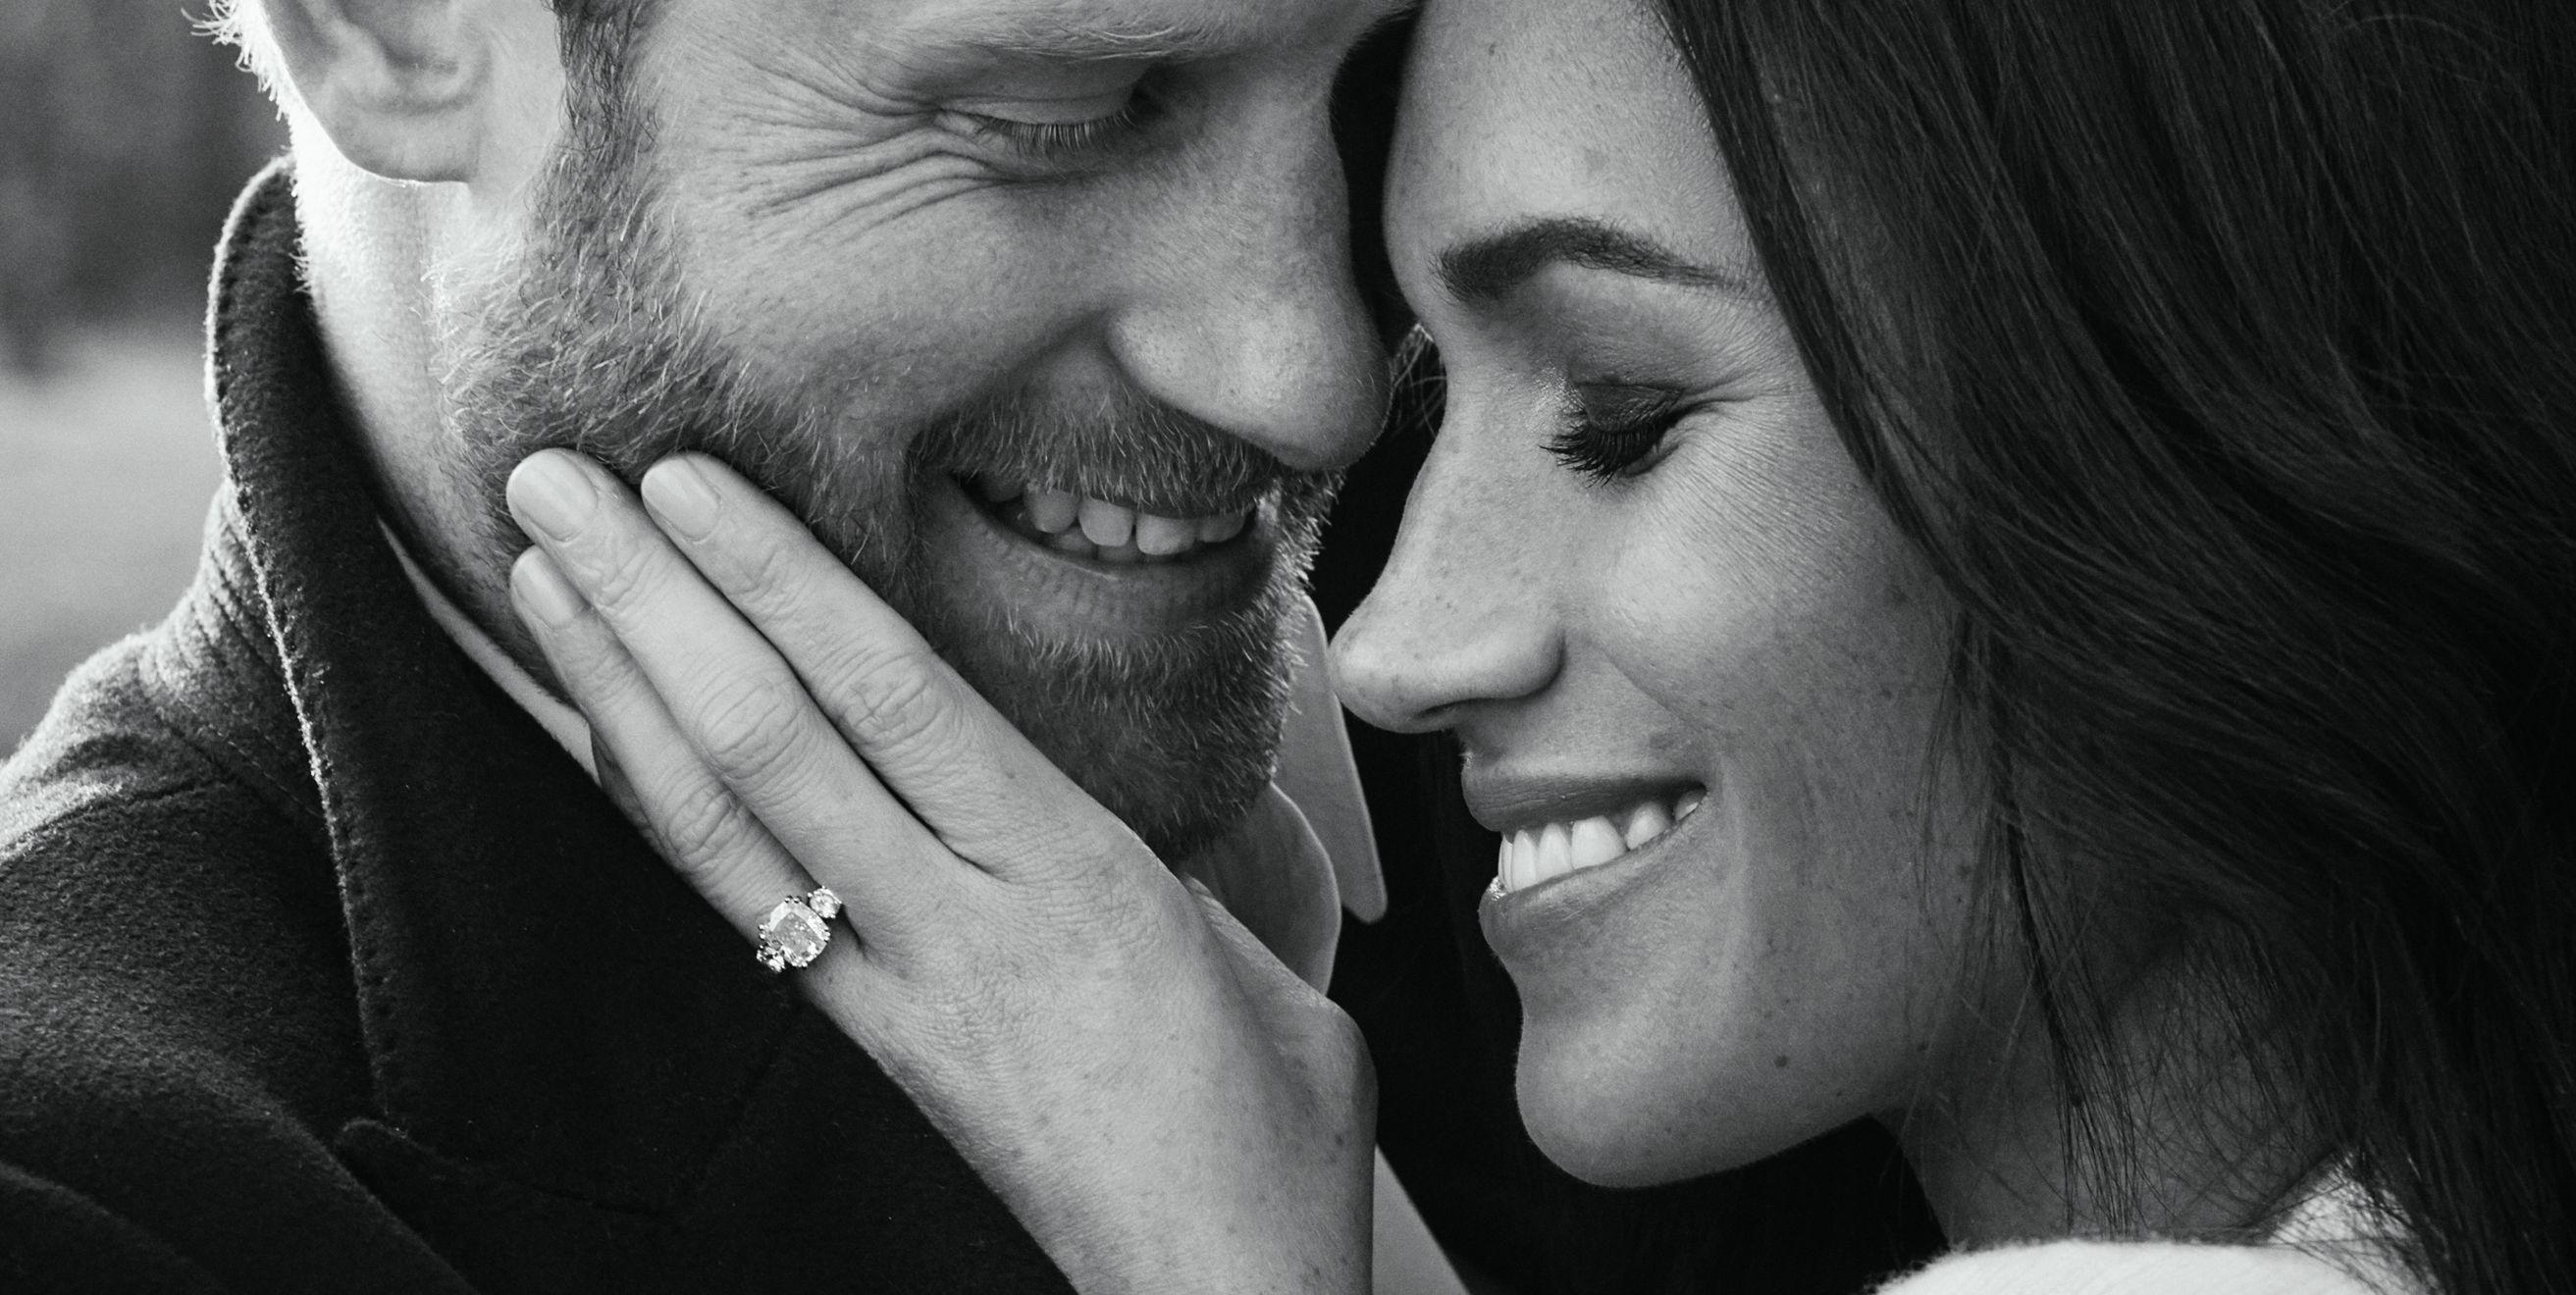 meghan markle's engagement ring